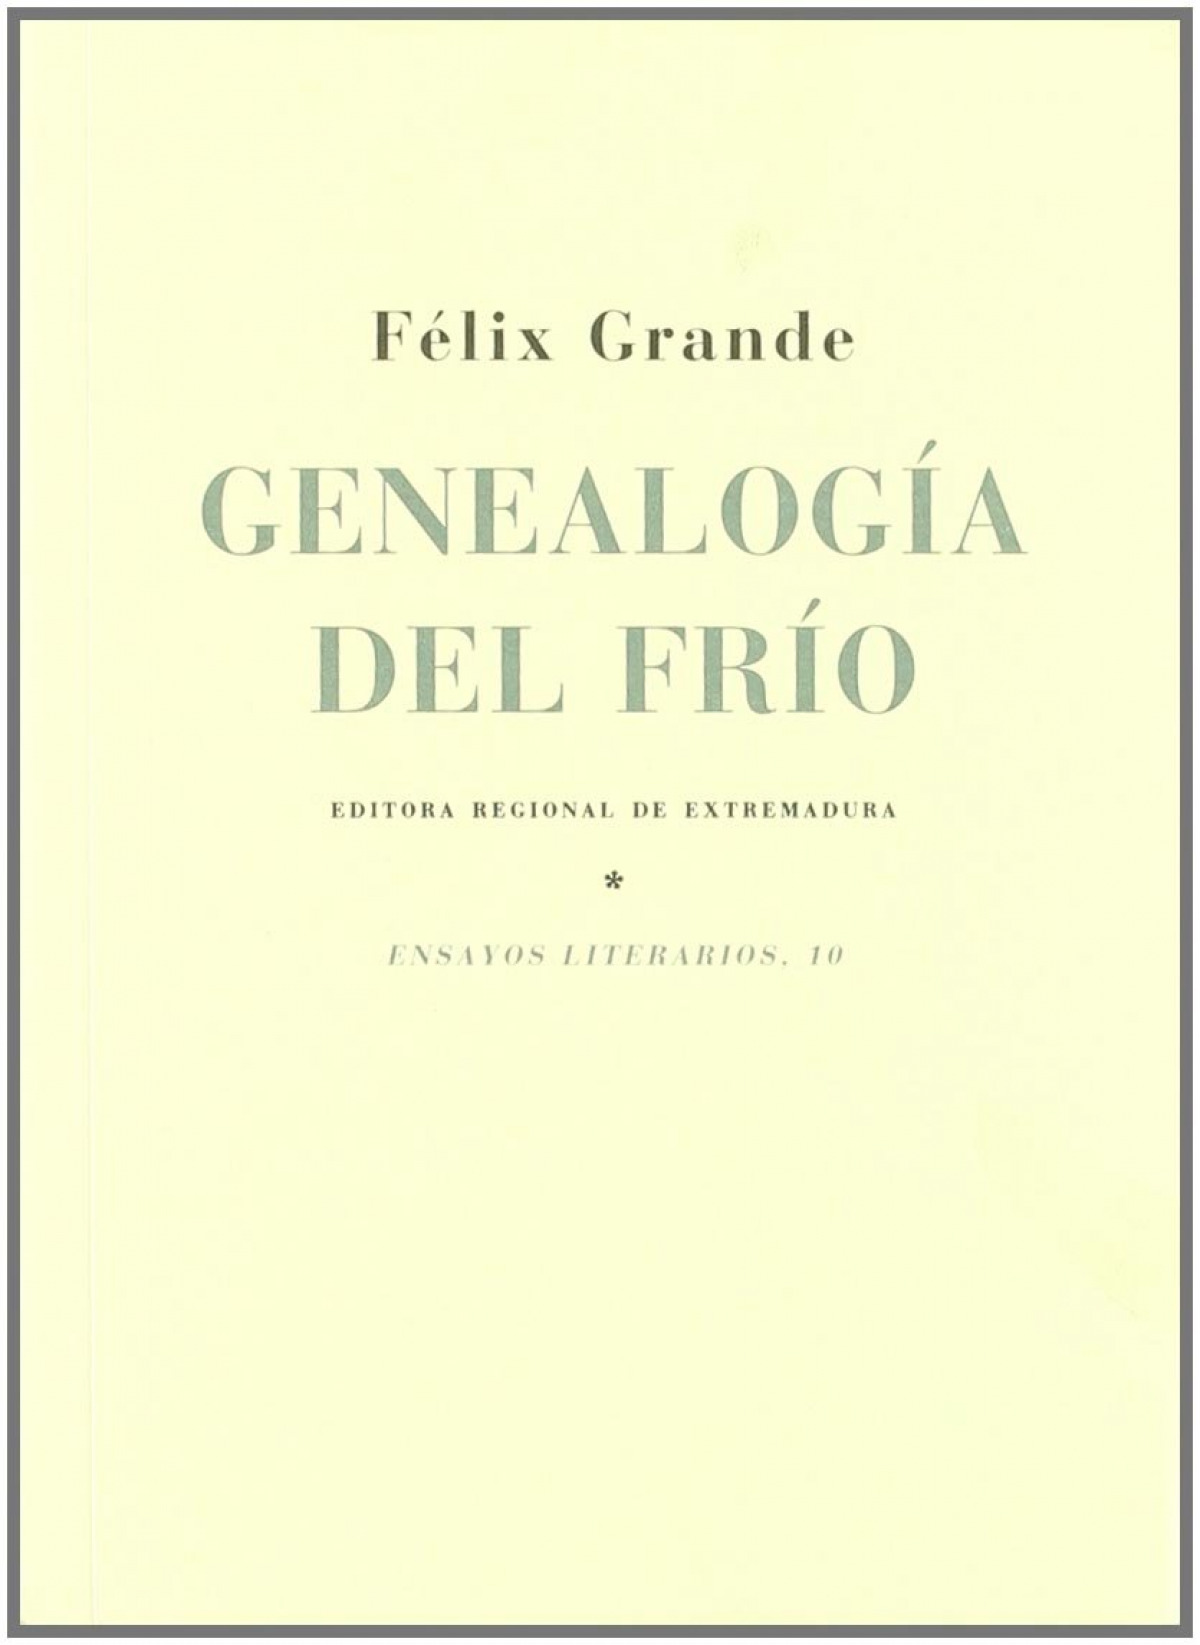 Genealogia del frio - Grande, Felix